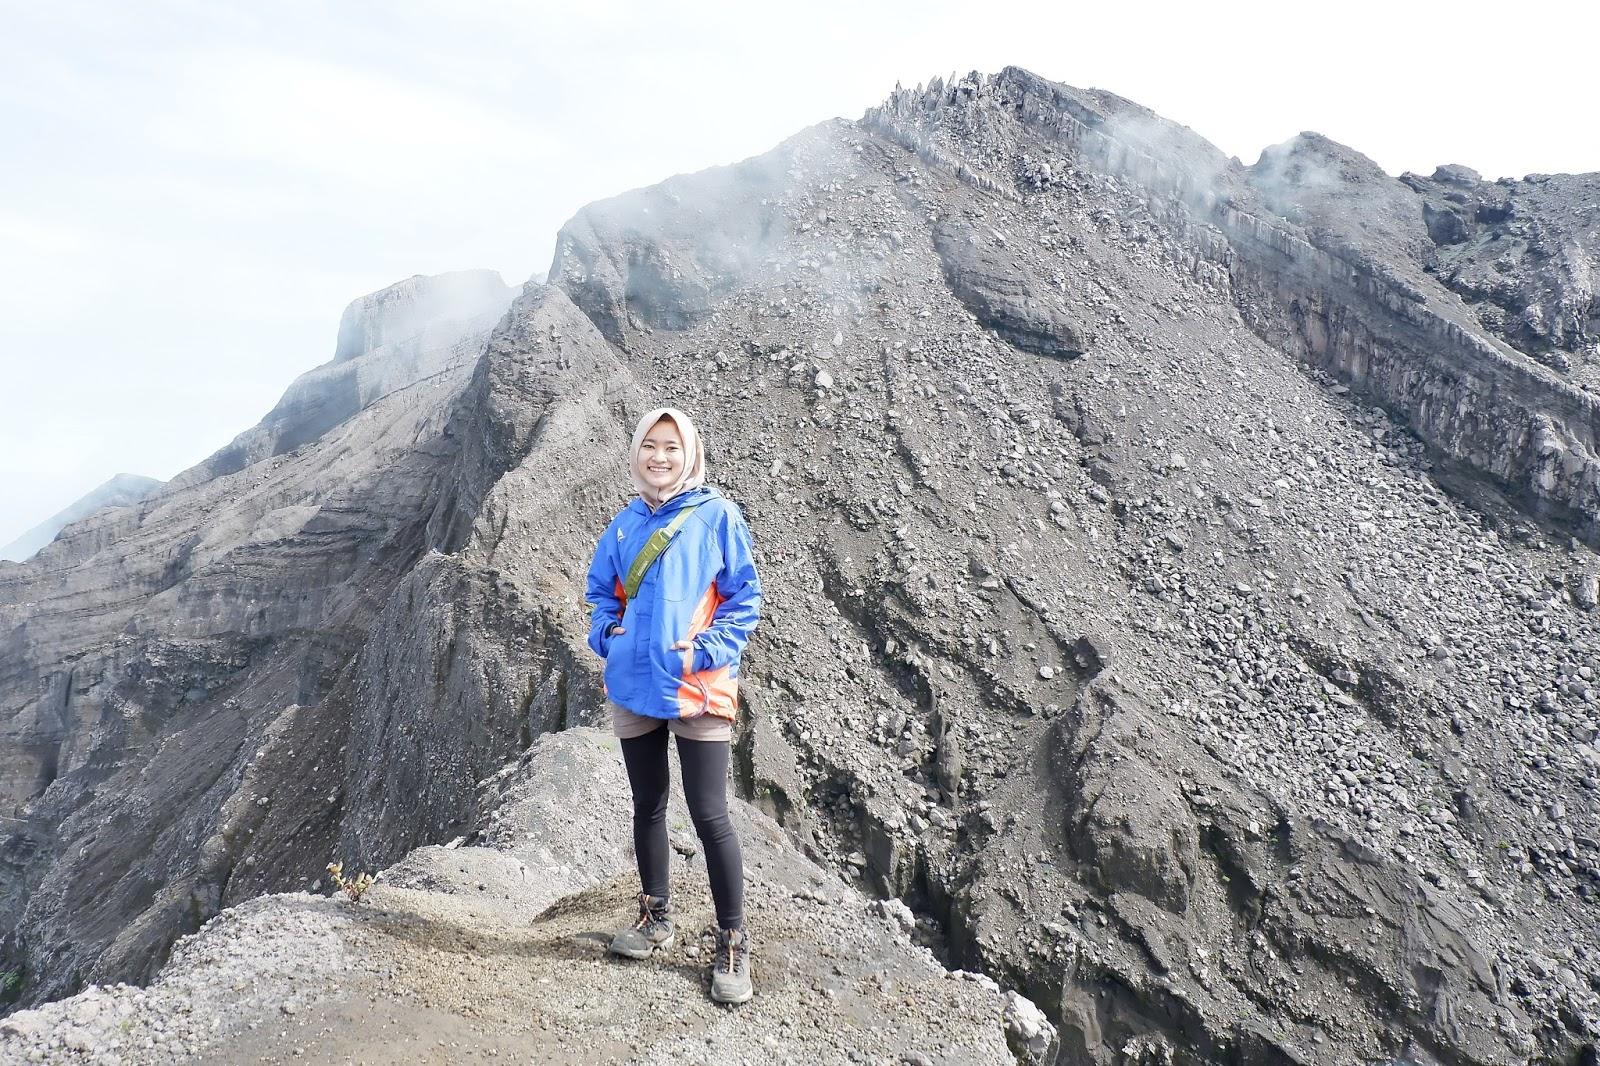 Cerita Anggar Pendakian Gunung Raung Via Kalibaru